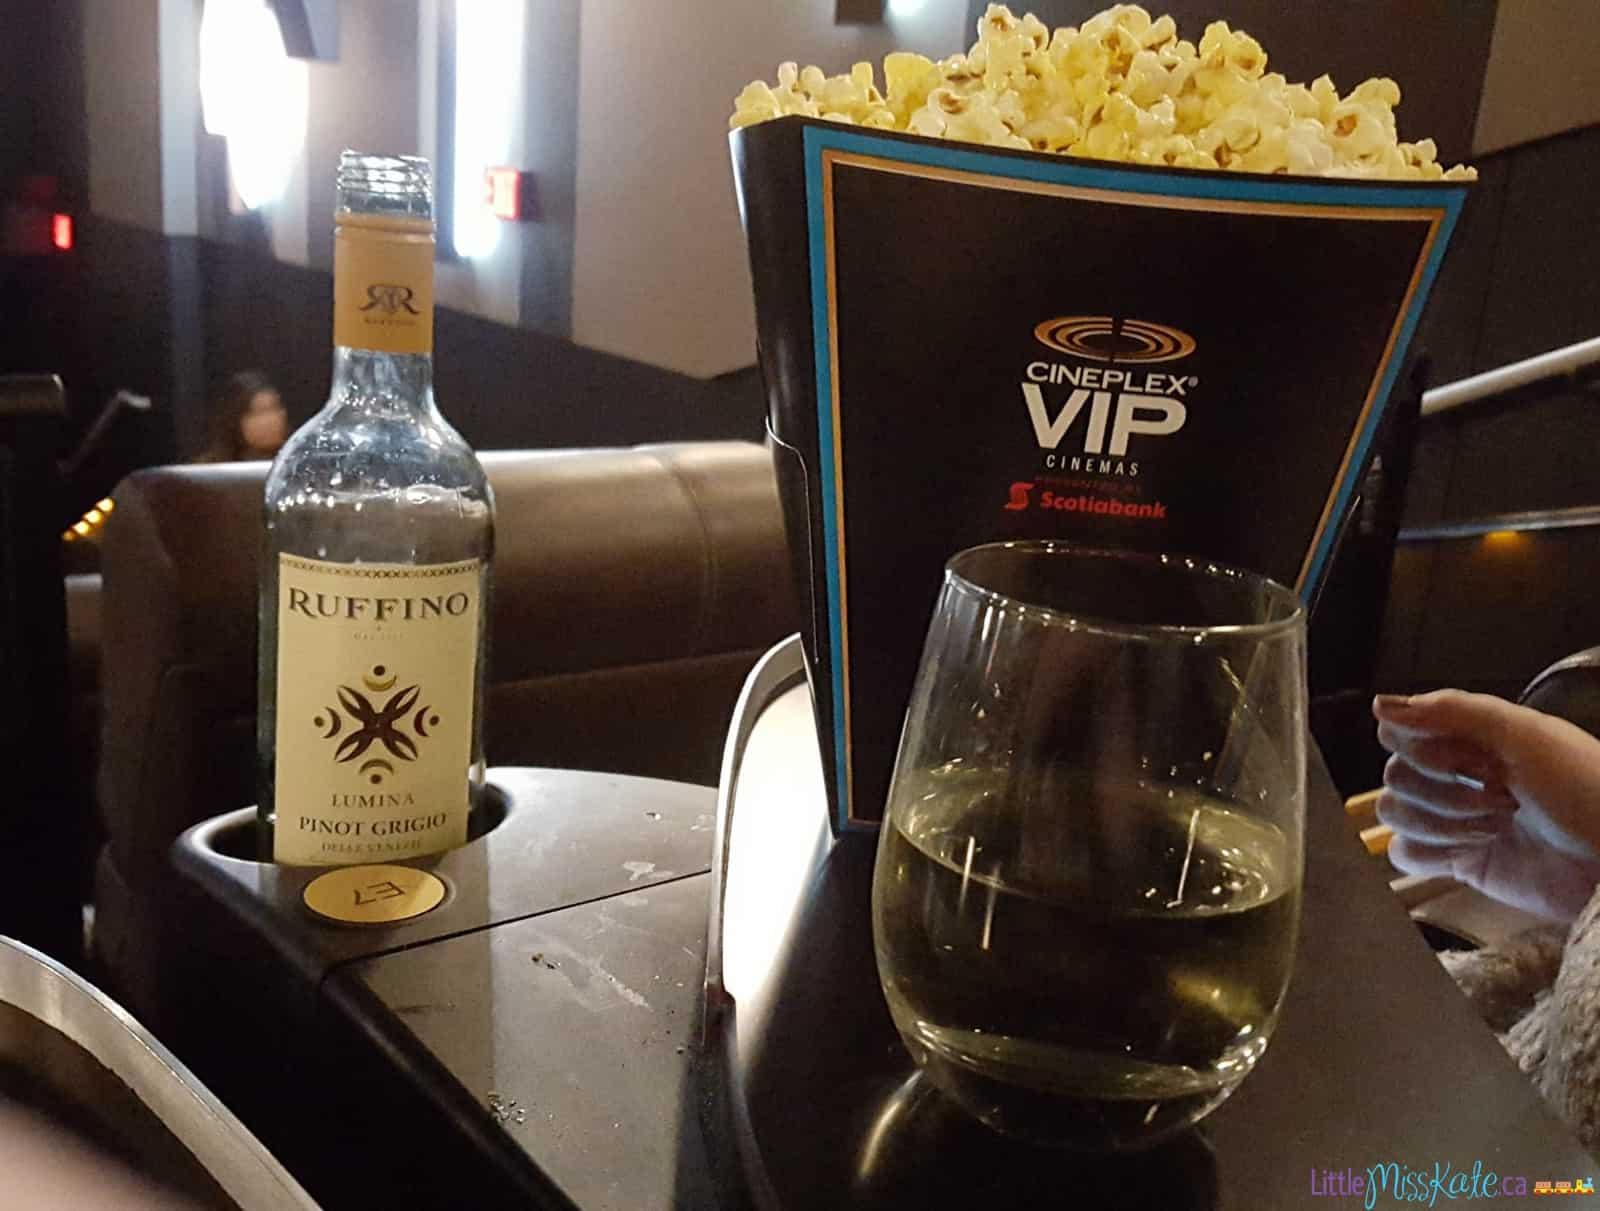 Cineplex VIP Movie Yonge Dundas